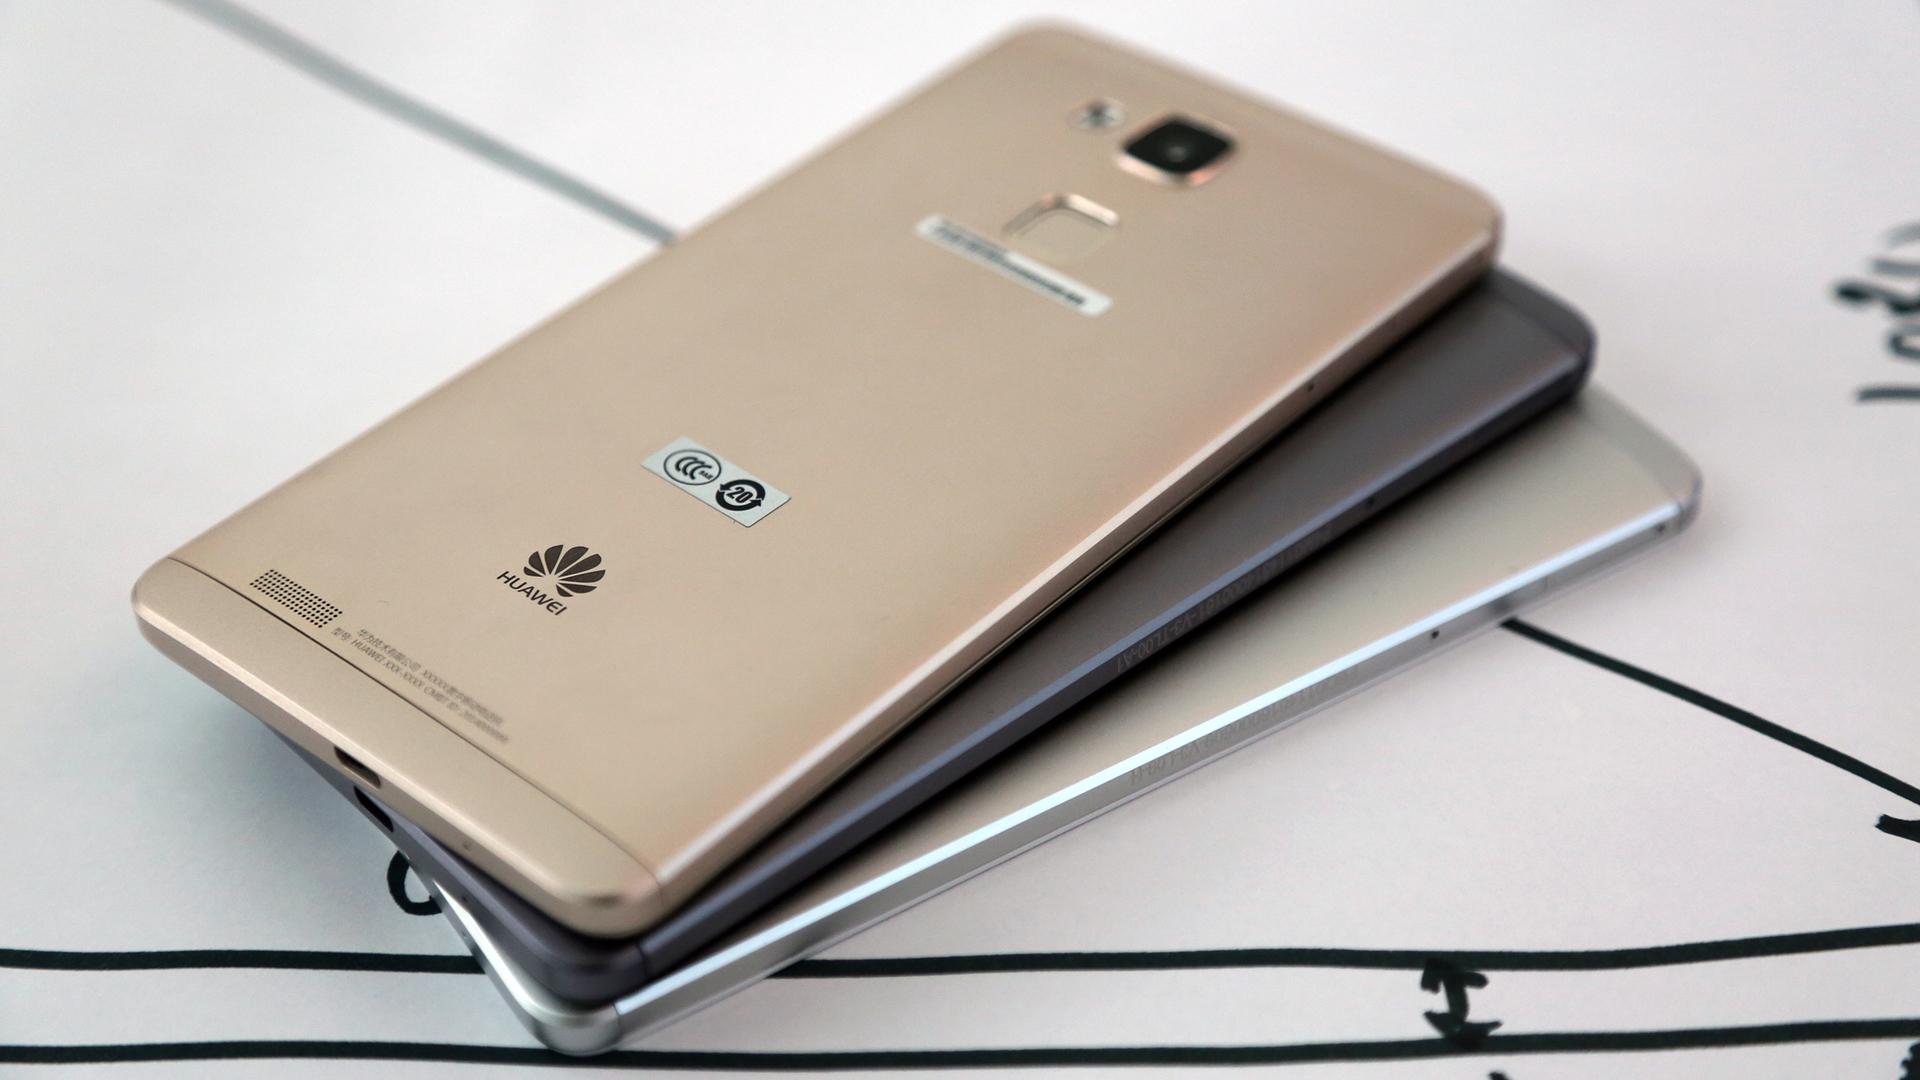 1сентября Huawei невыпустит Mate либо Mate S2